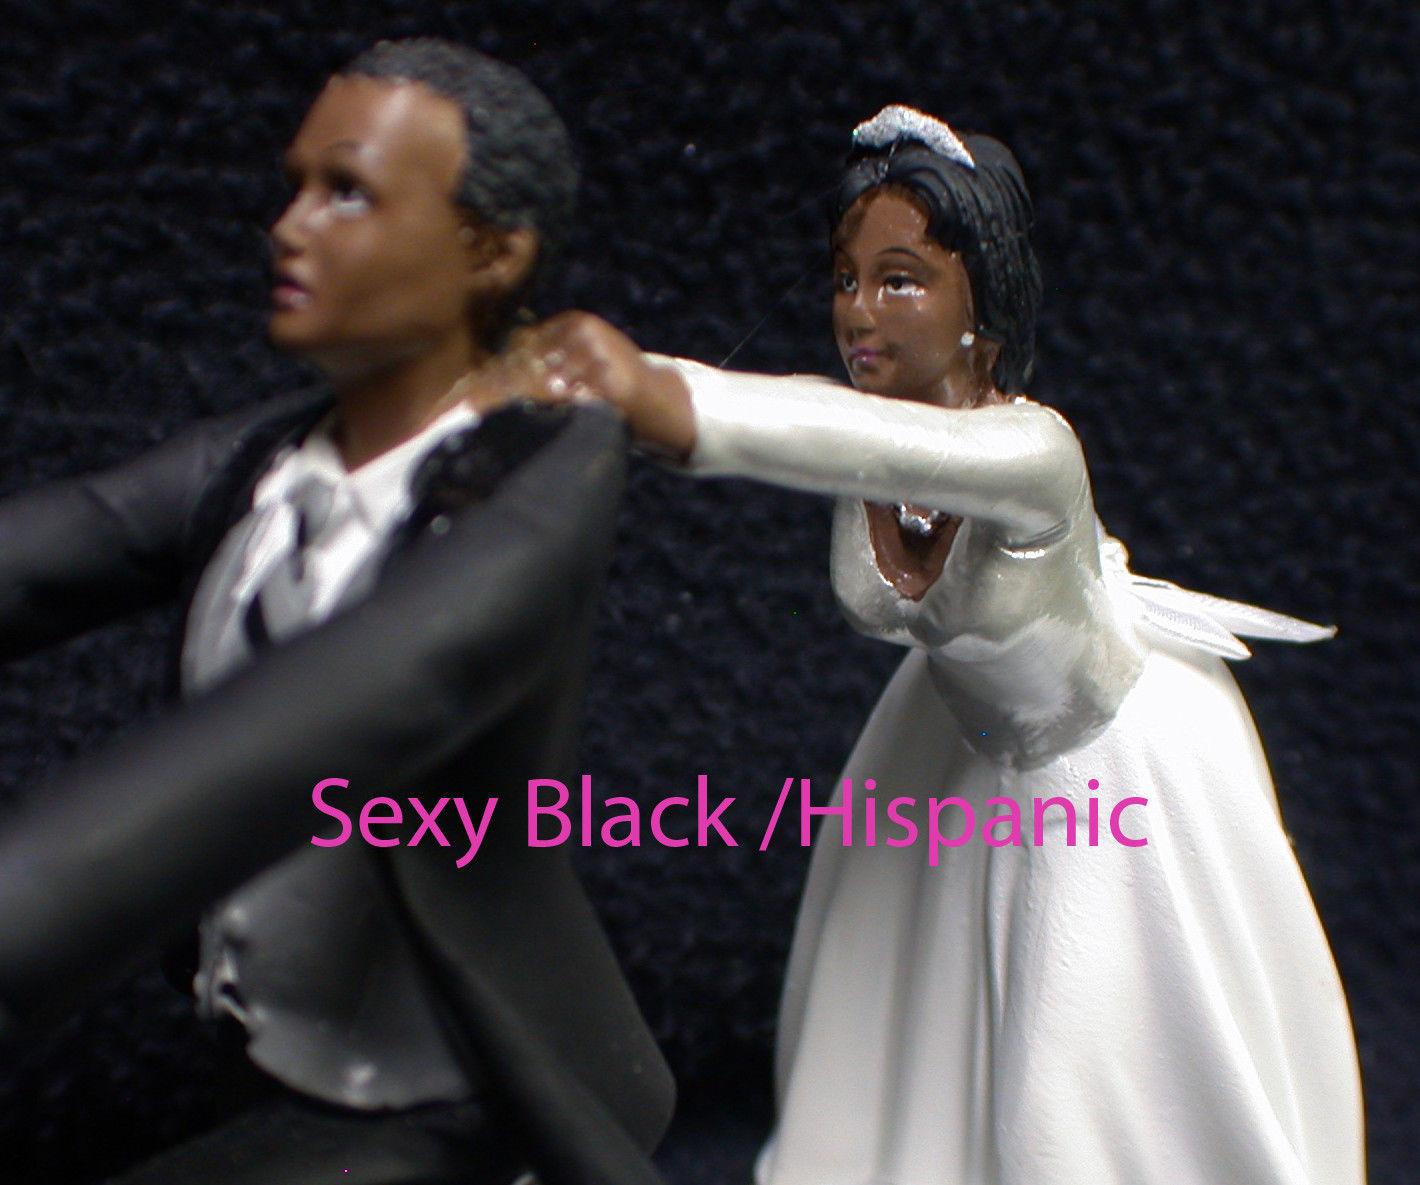 Wedding Cake Topper W/Yellow Honda Motorcycle White Black Hispanic Groom top NEW